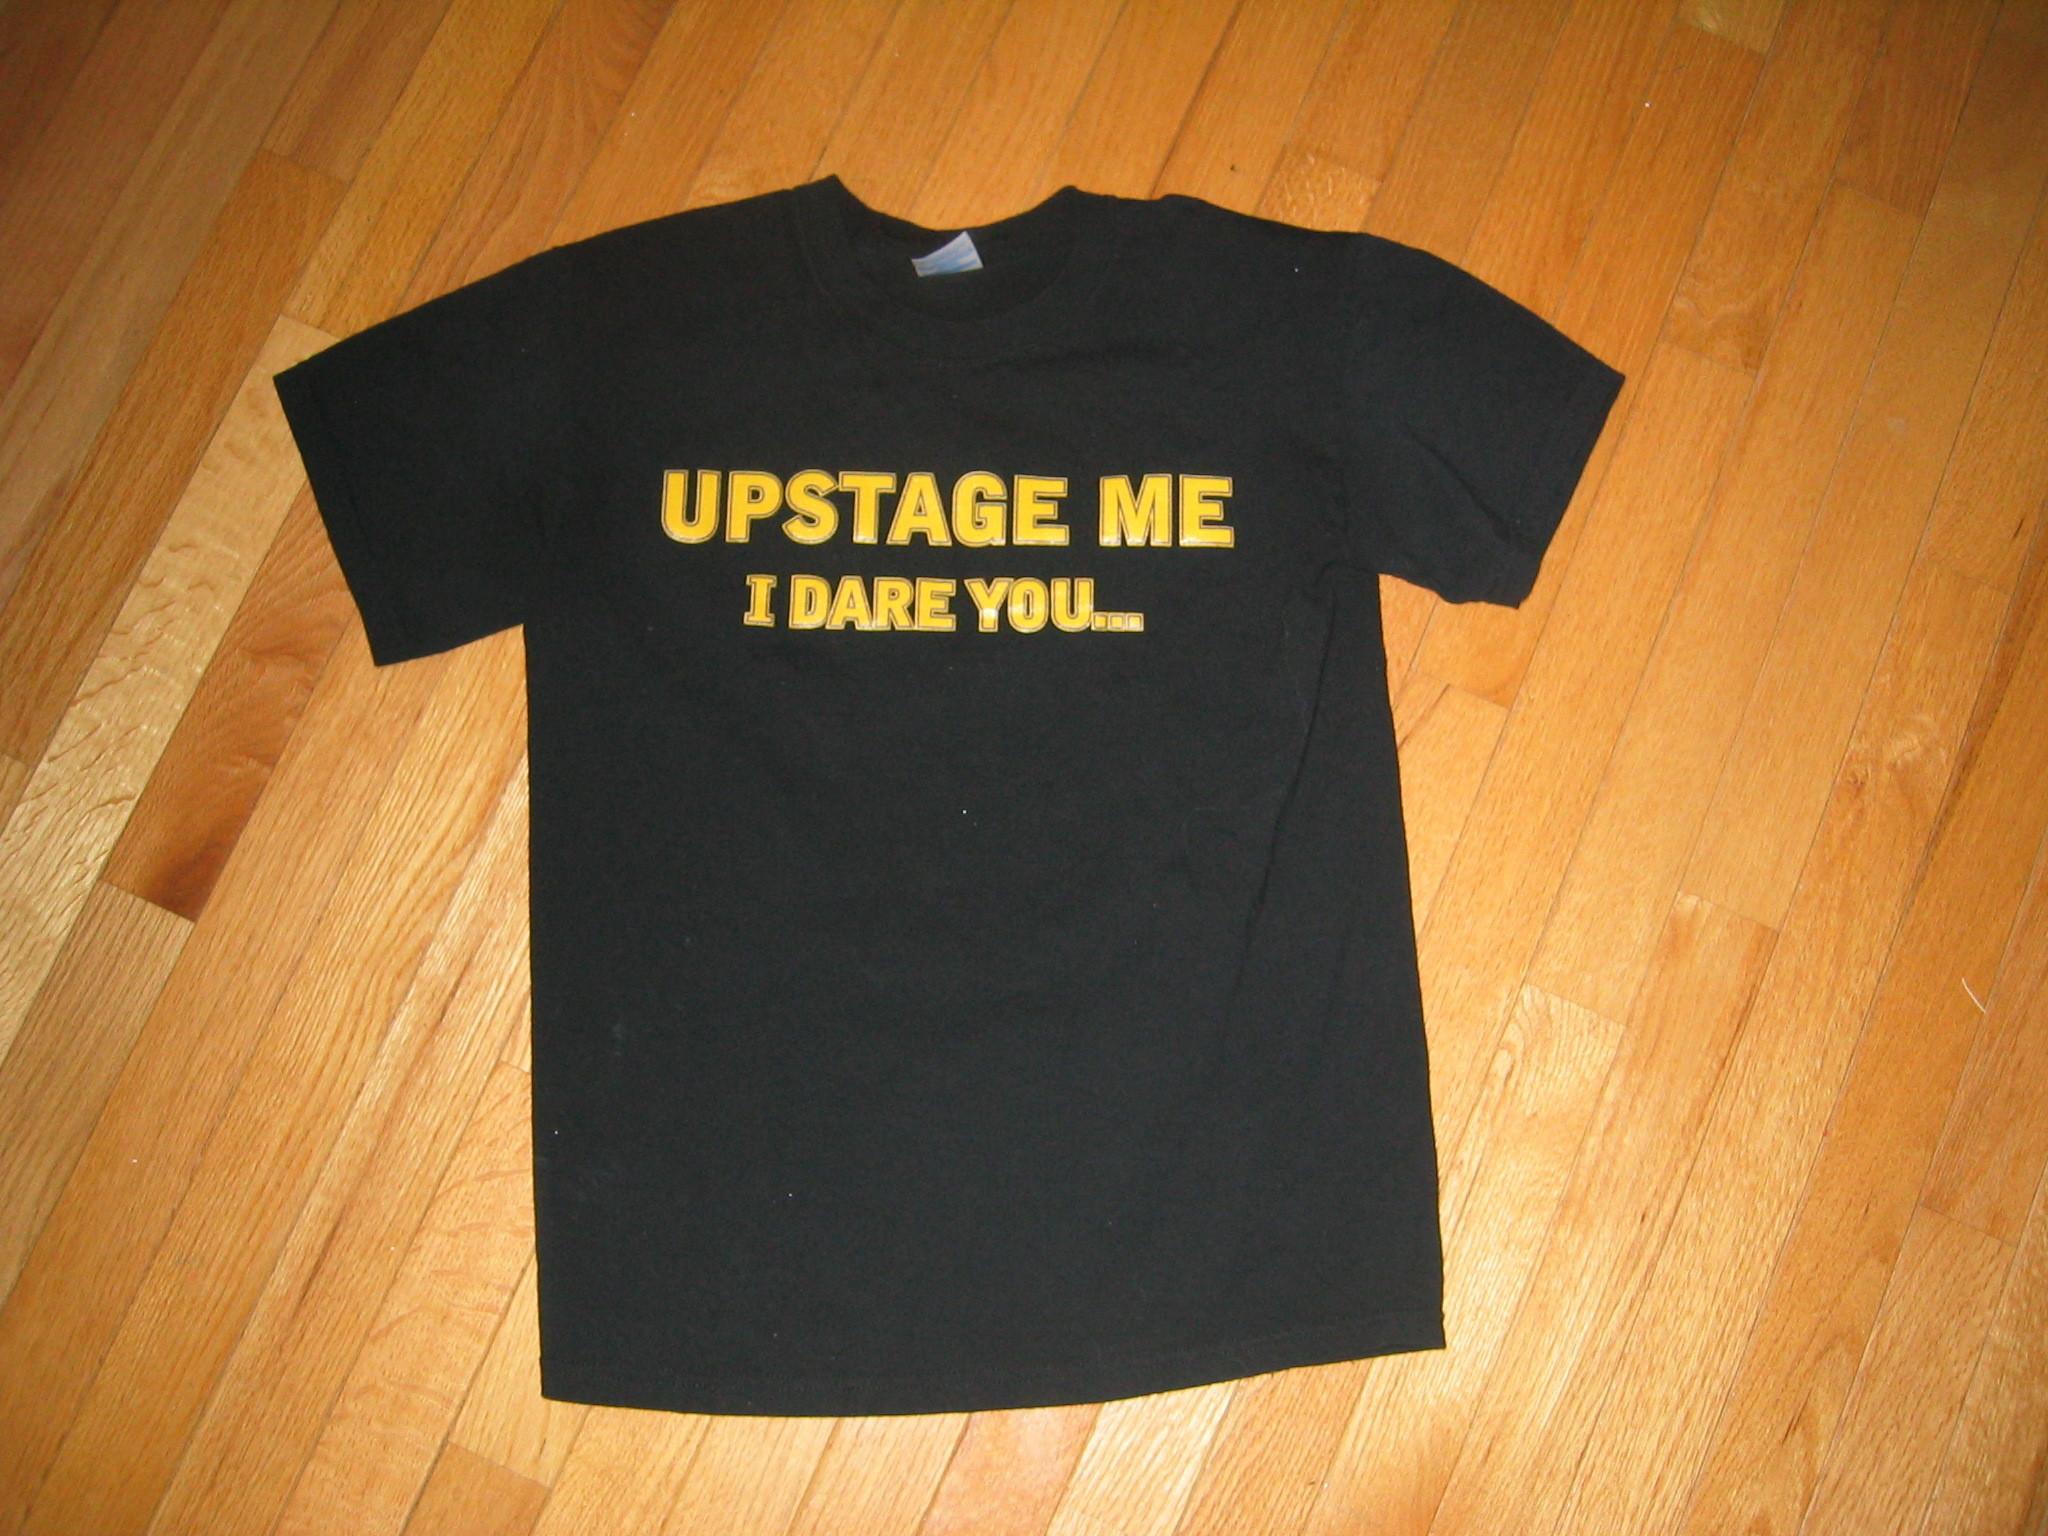 Coolest t-shirt ever!